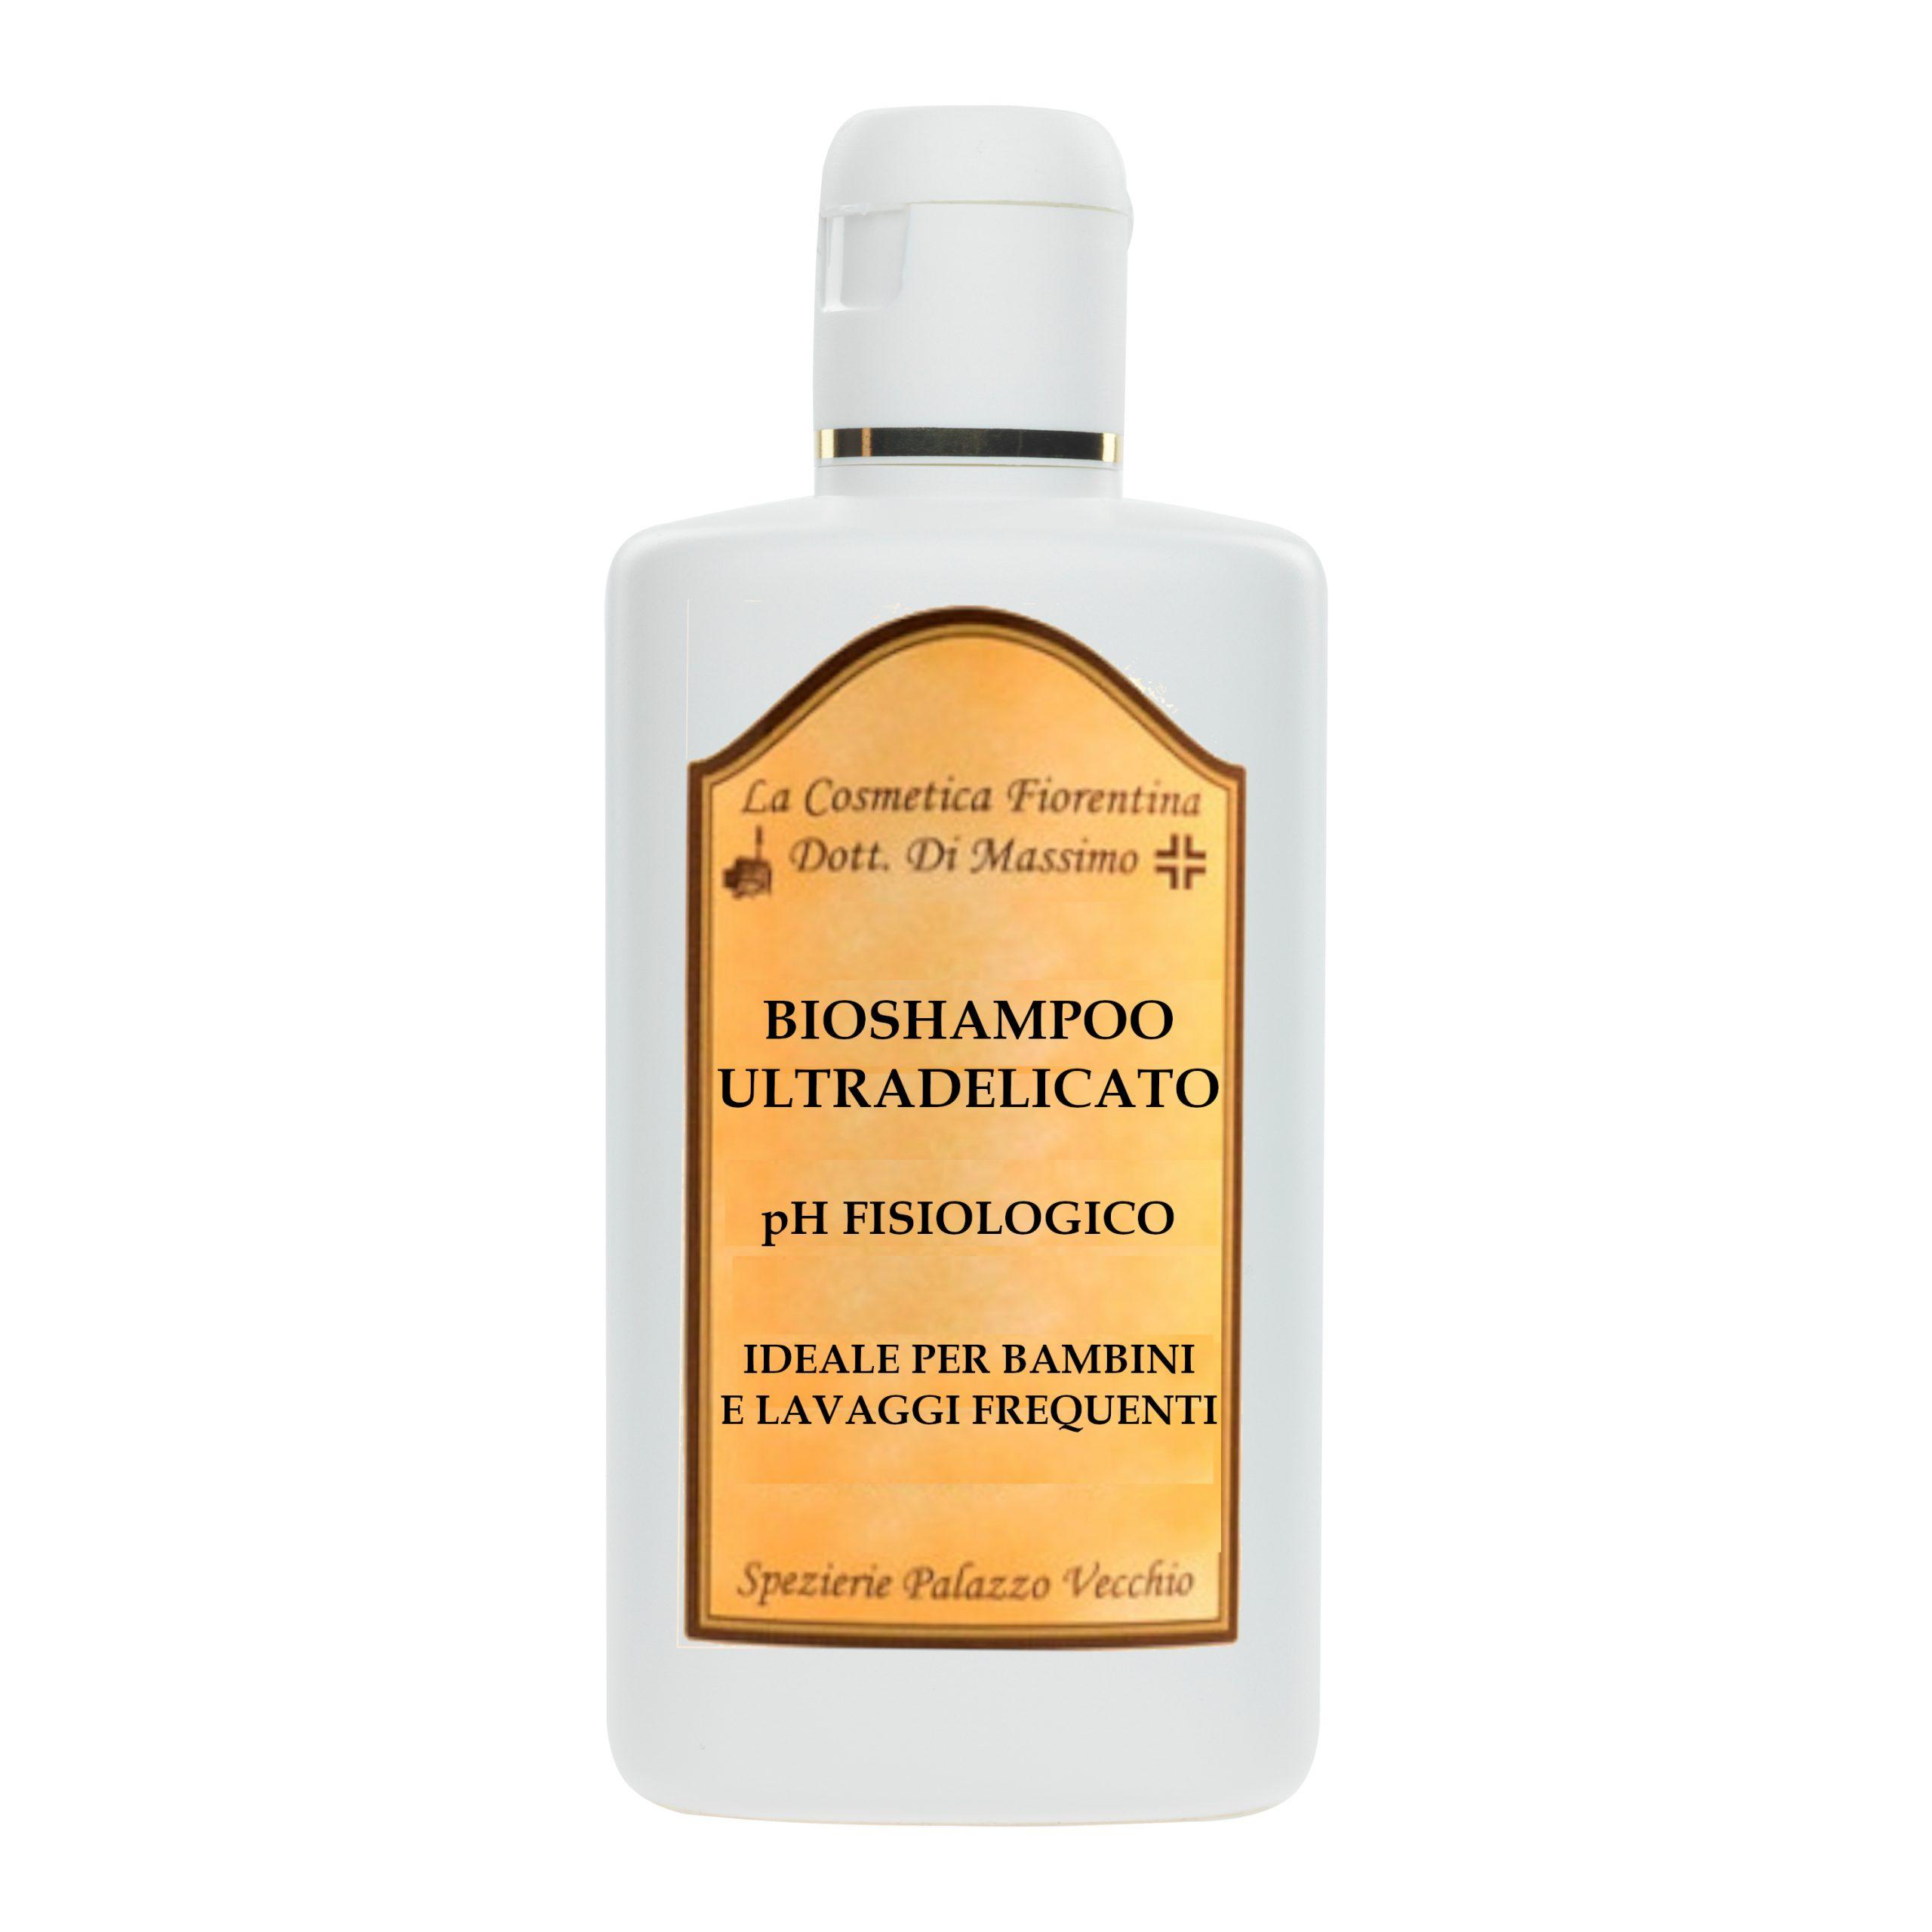 BIOSHAMPOO ULTRADELICATO-0